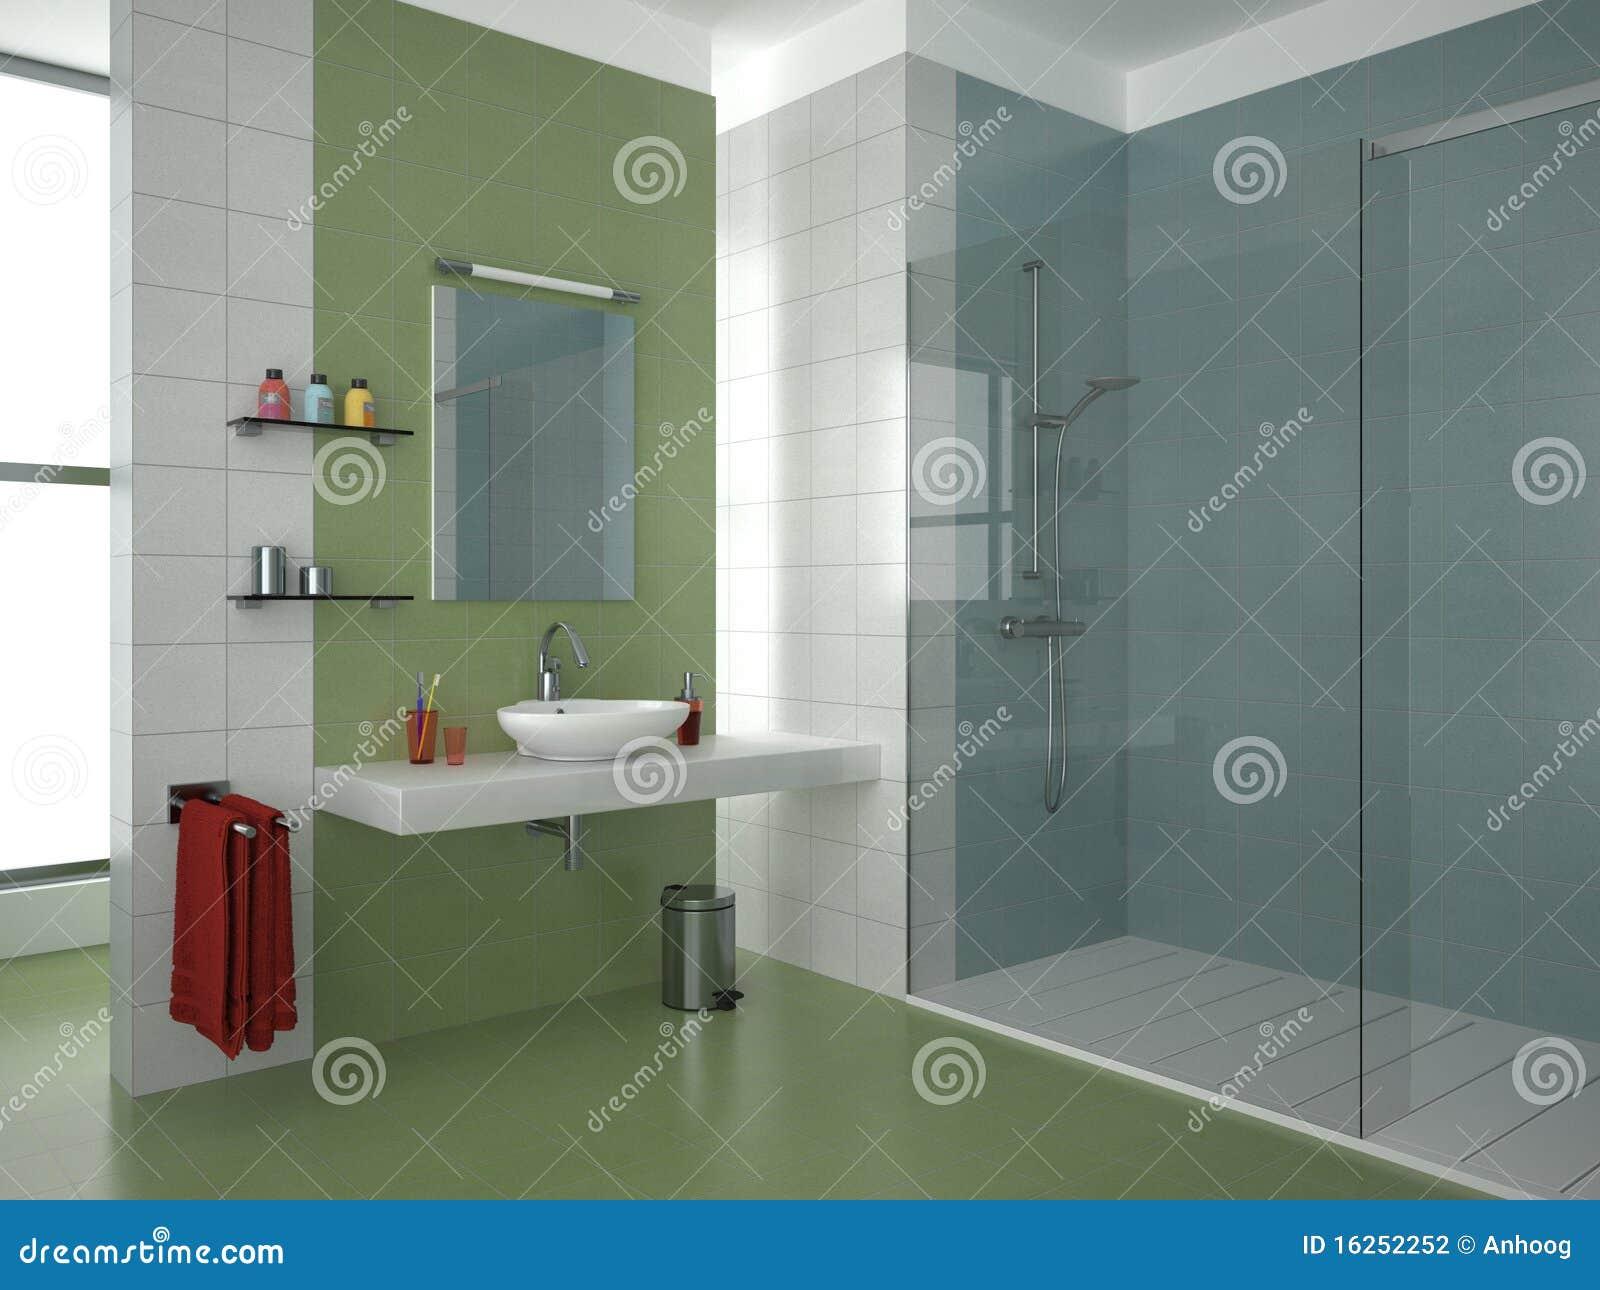 Grünes Badezimmer Aufpeppen # Goetics.com > Inspiration Design Raum ...